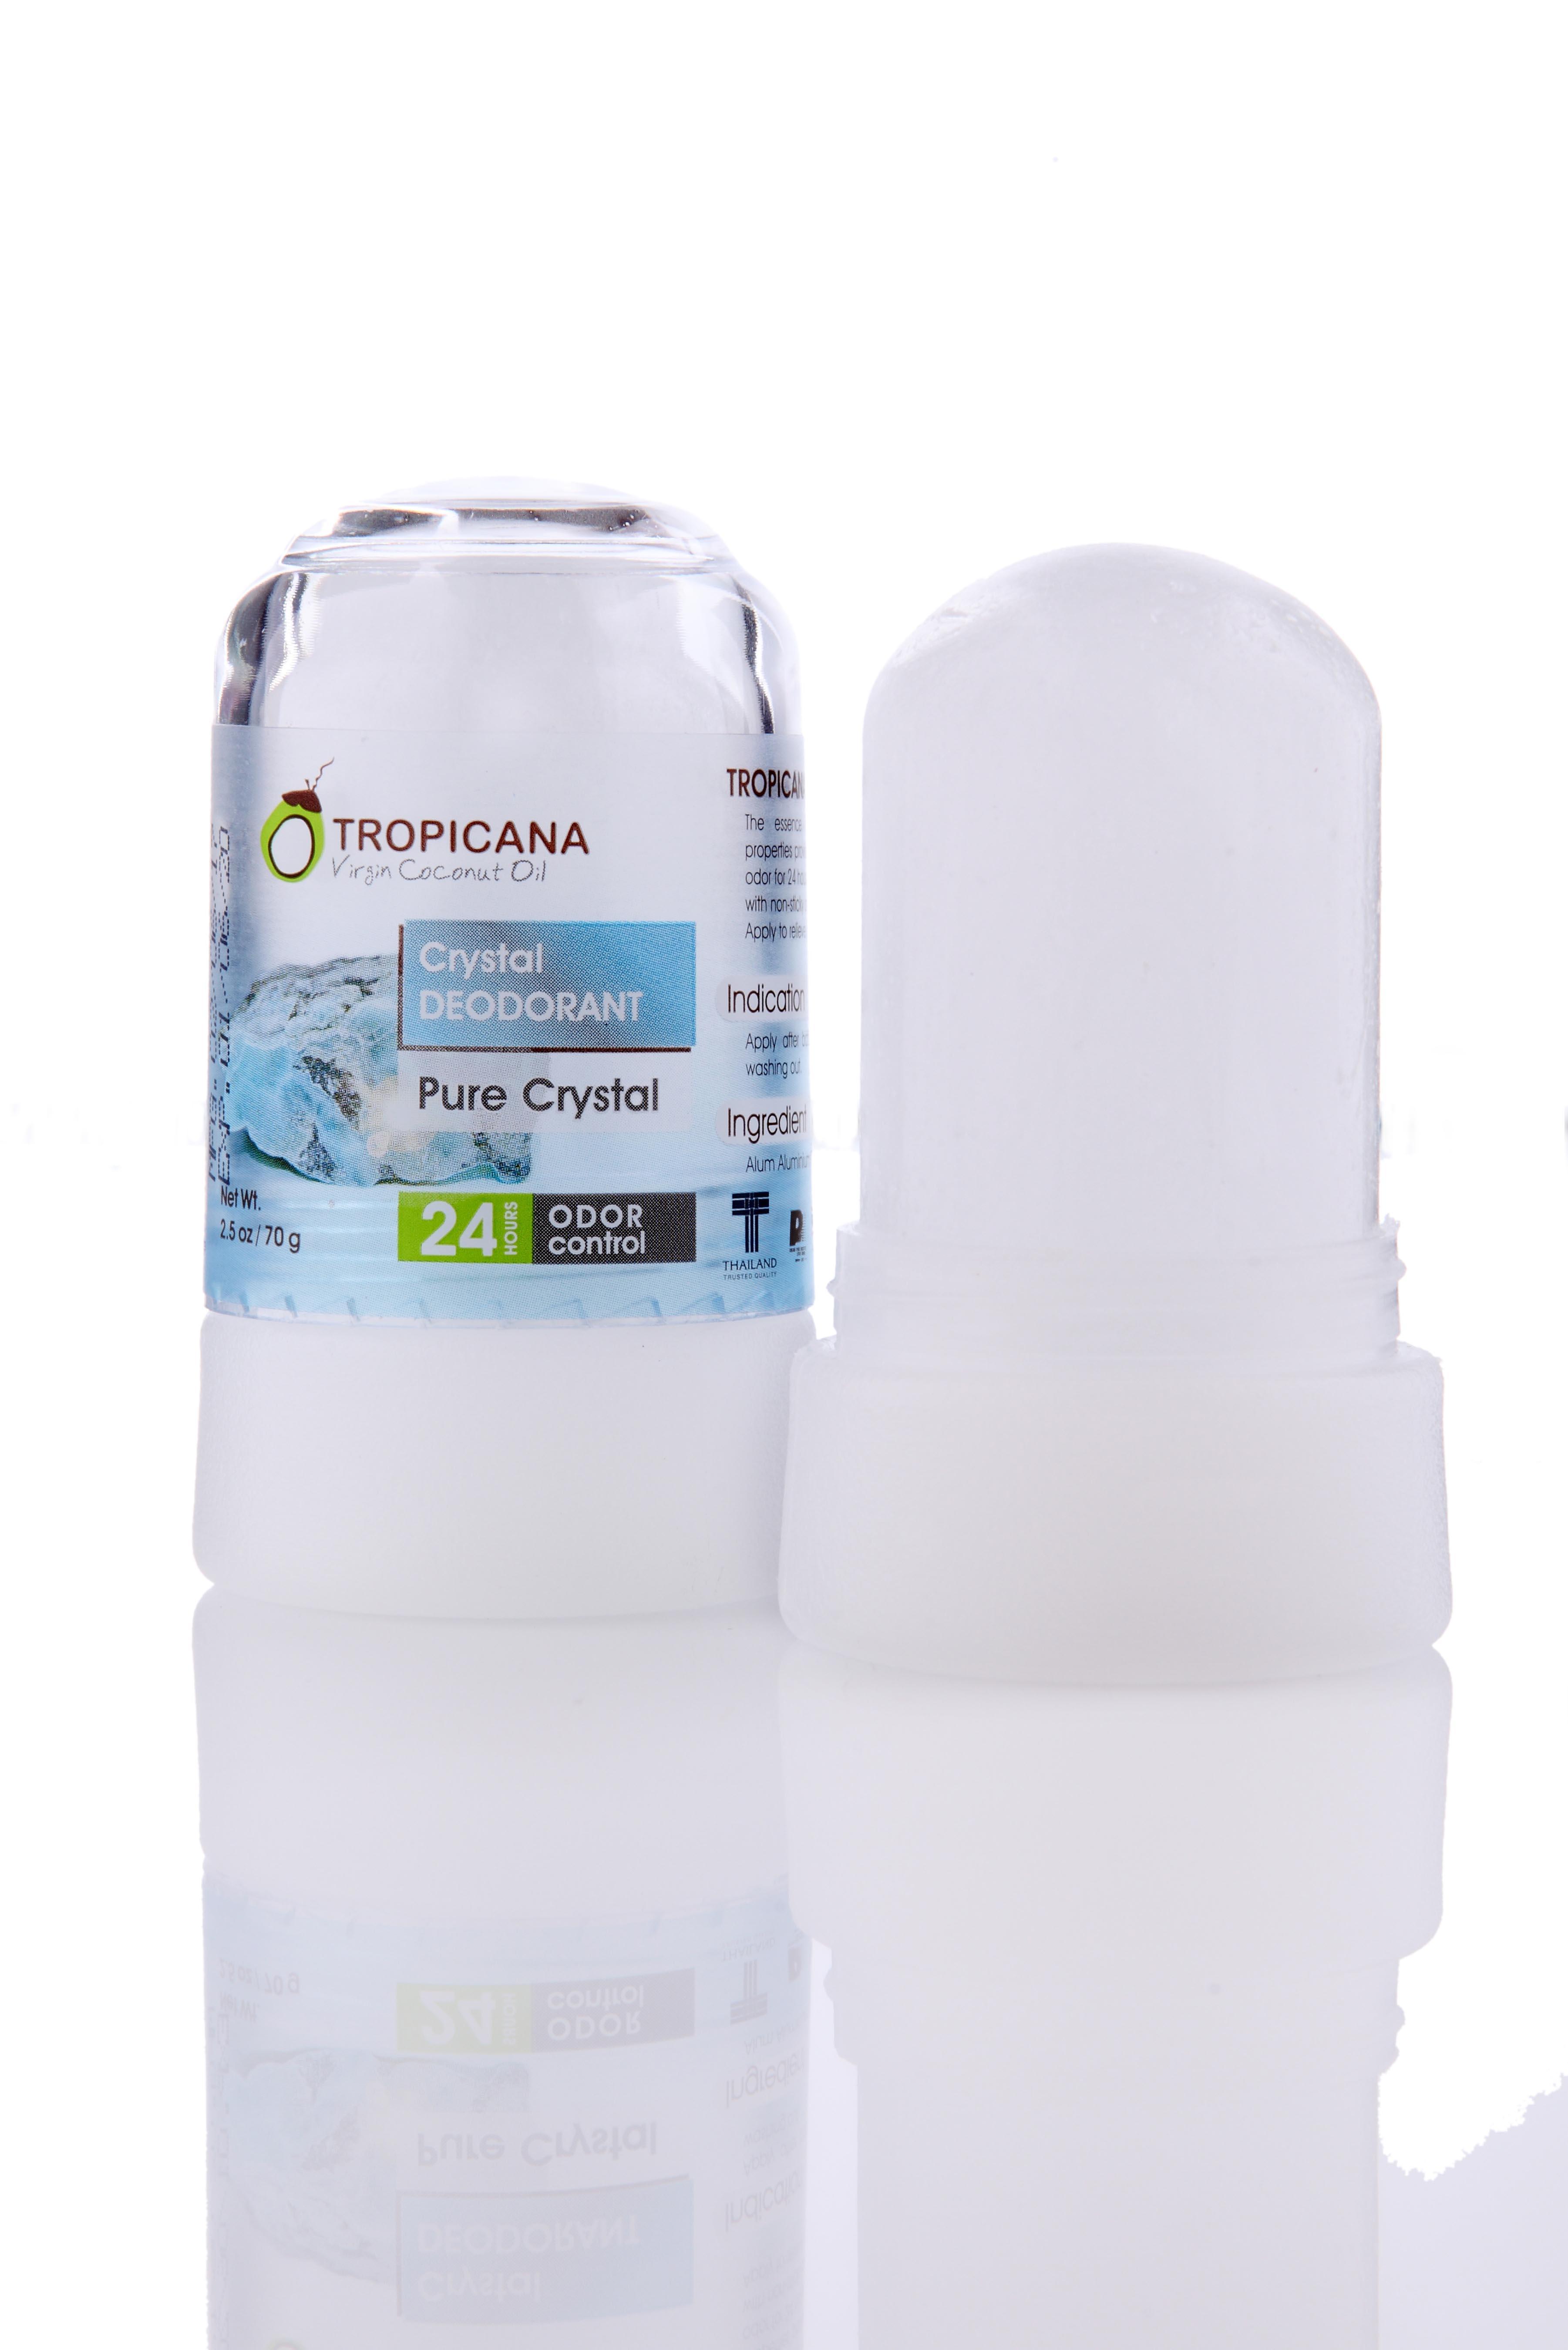 Натуральный дезодорант кристалл Tropicana 'Чистый кристалл',